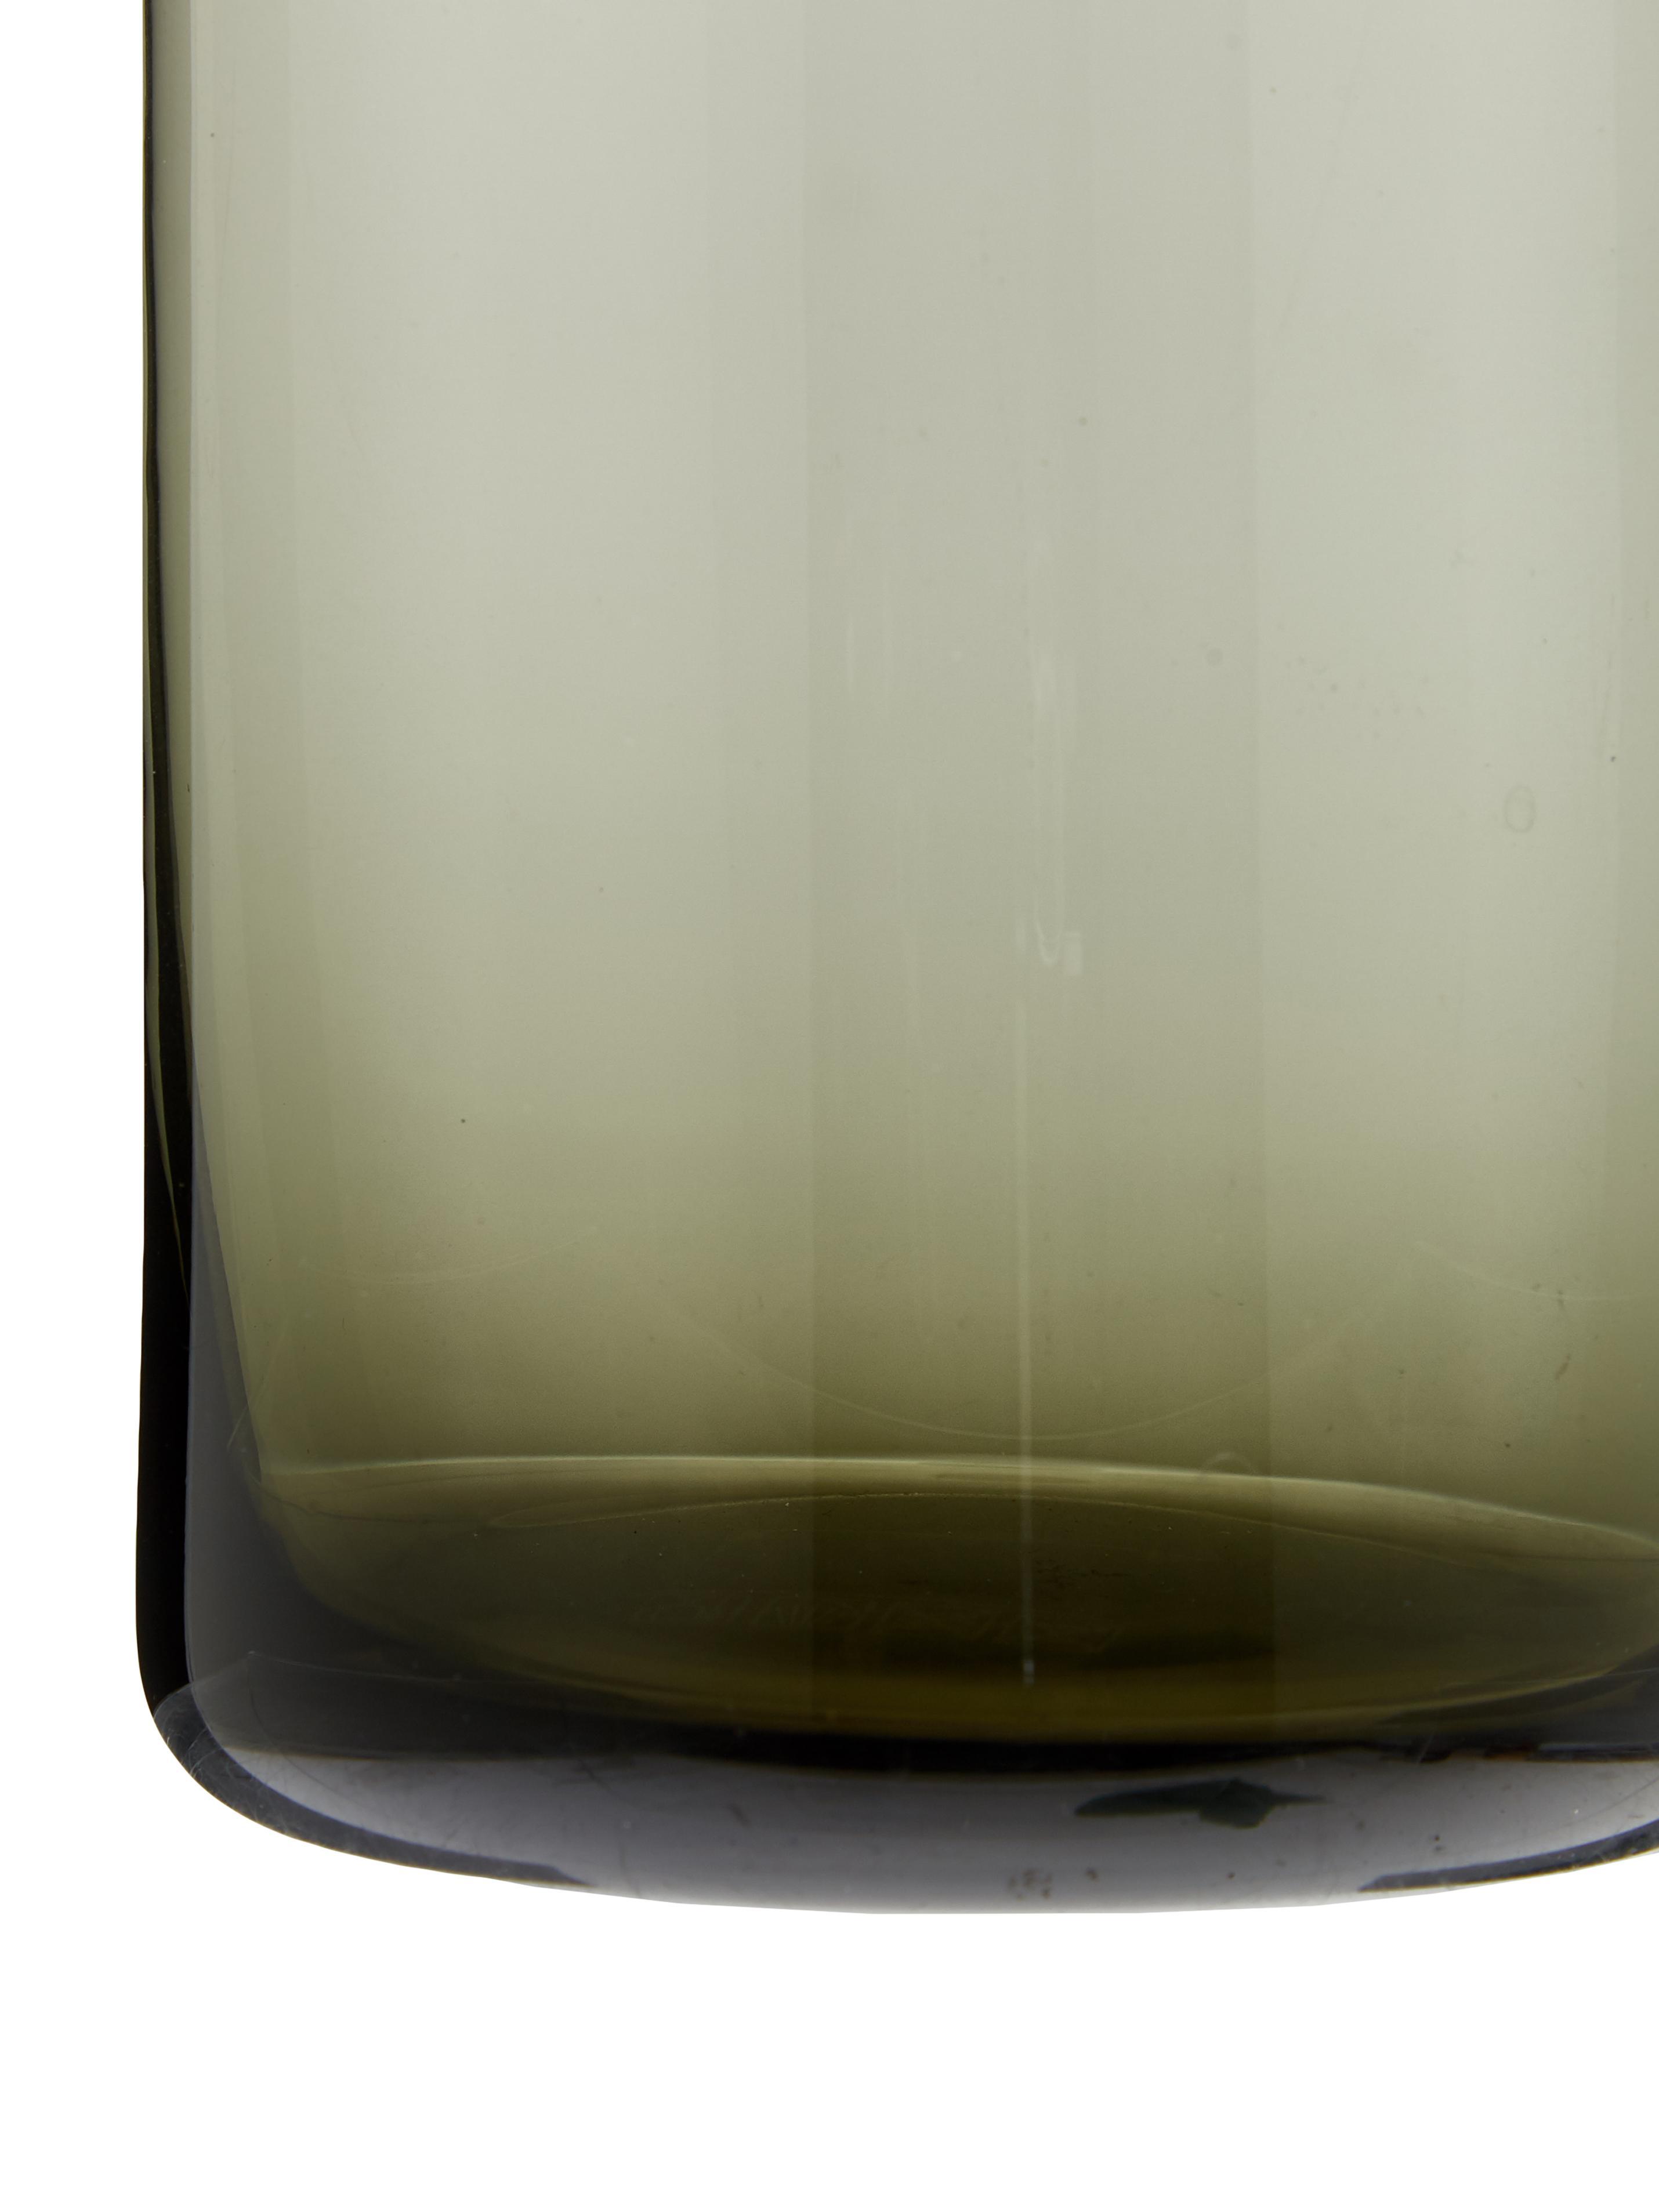 Karaffe Clearance in Grau transparent, Deckel: Kork, Grau, transparent, 1 L